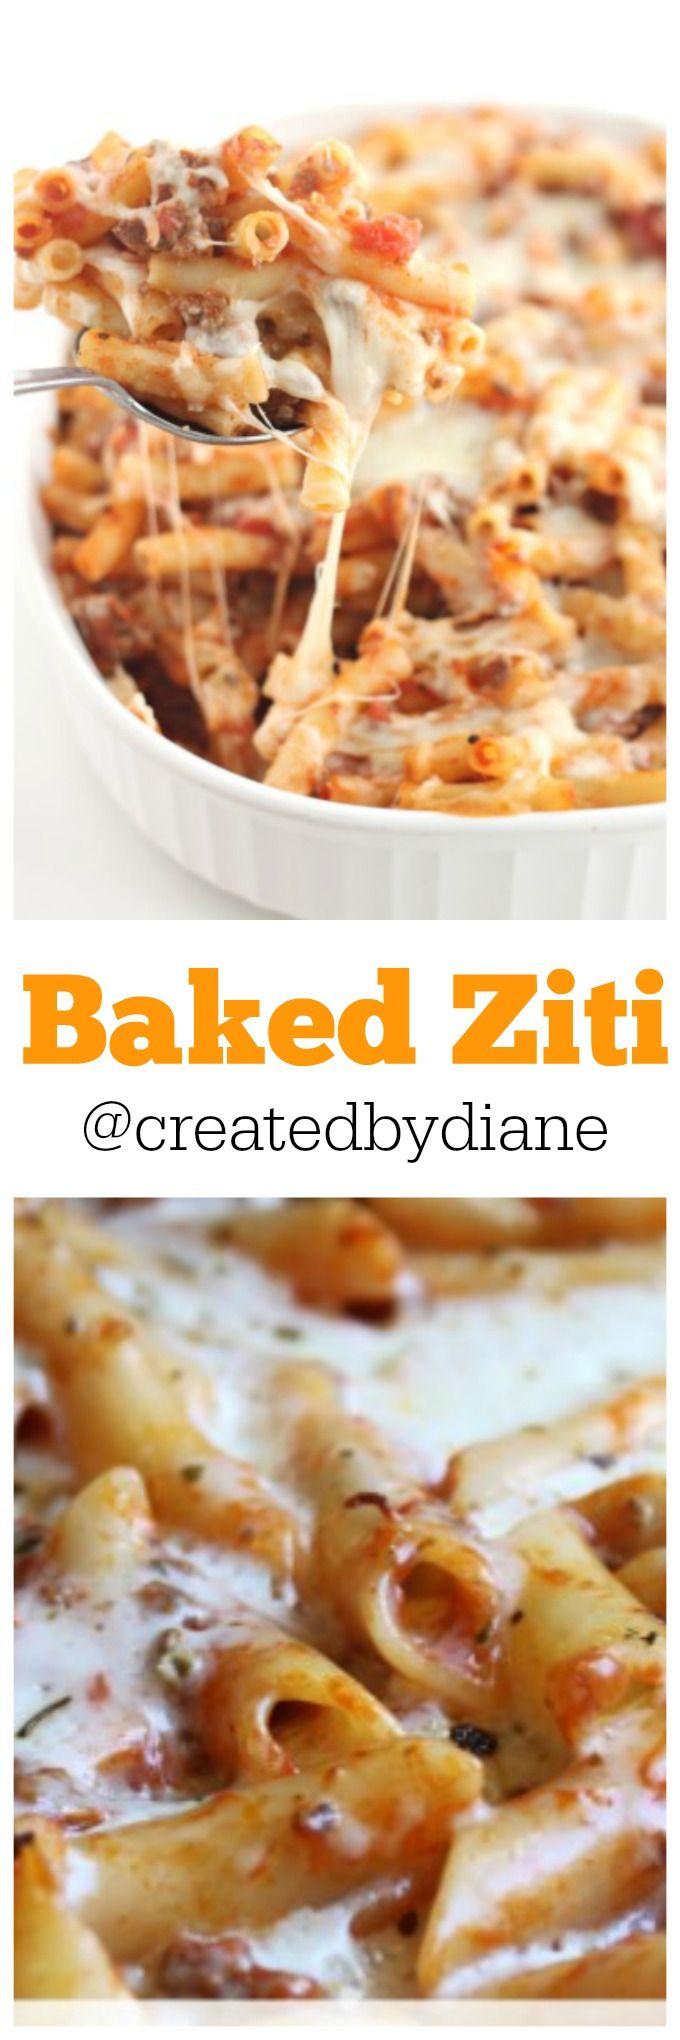 Baked Ziti from @createdbydiane